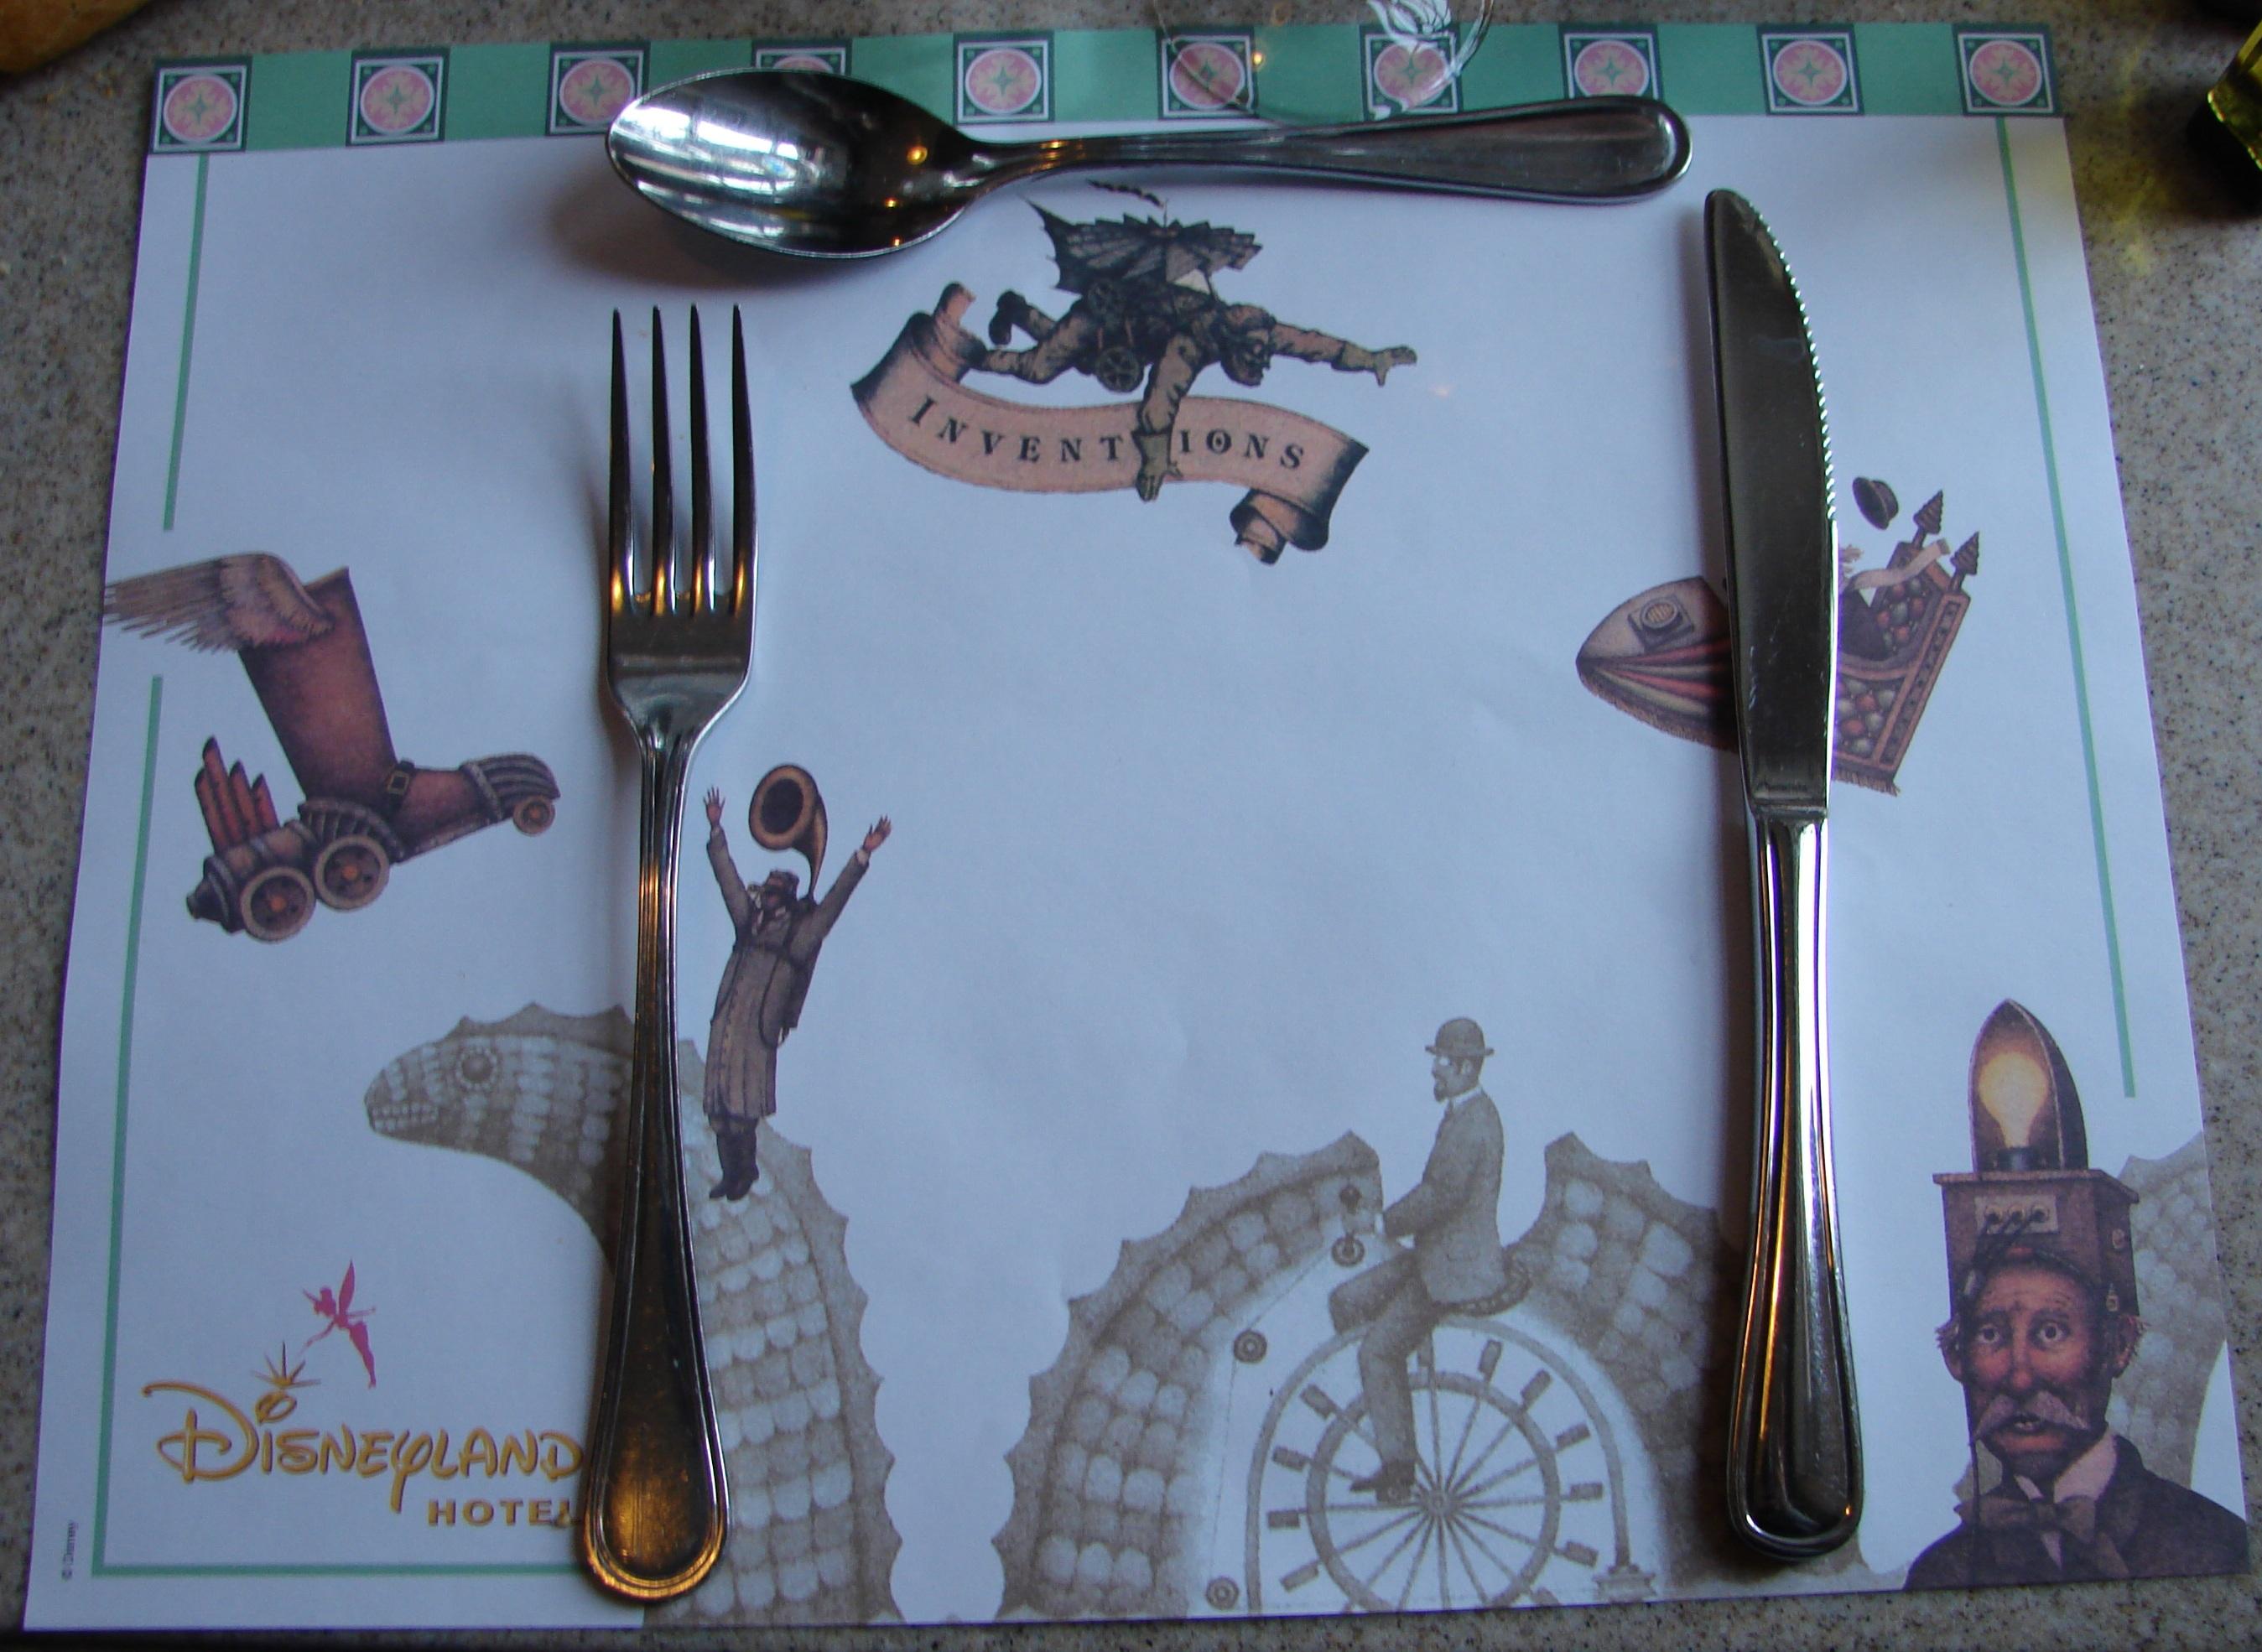 Restaurant inventions disneyland hotel disneyland paris for Set de table paris